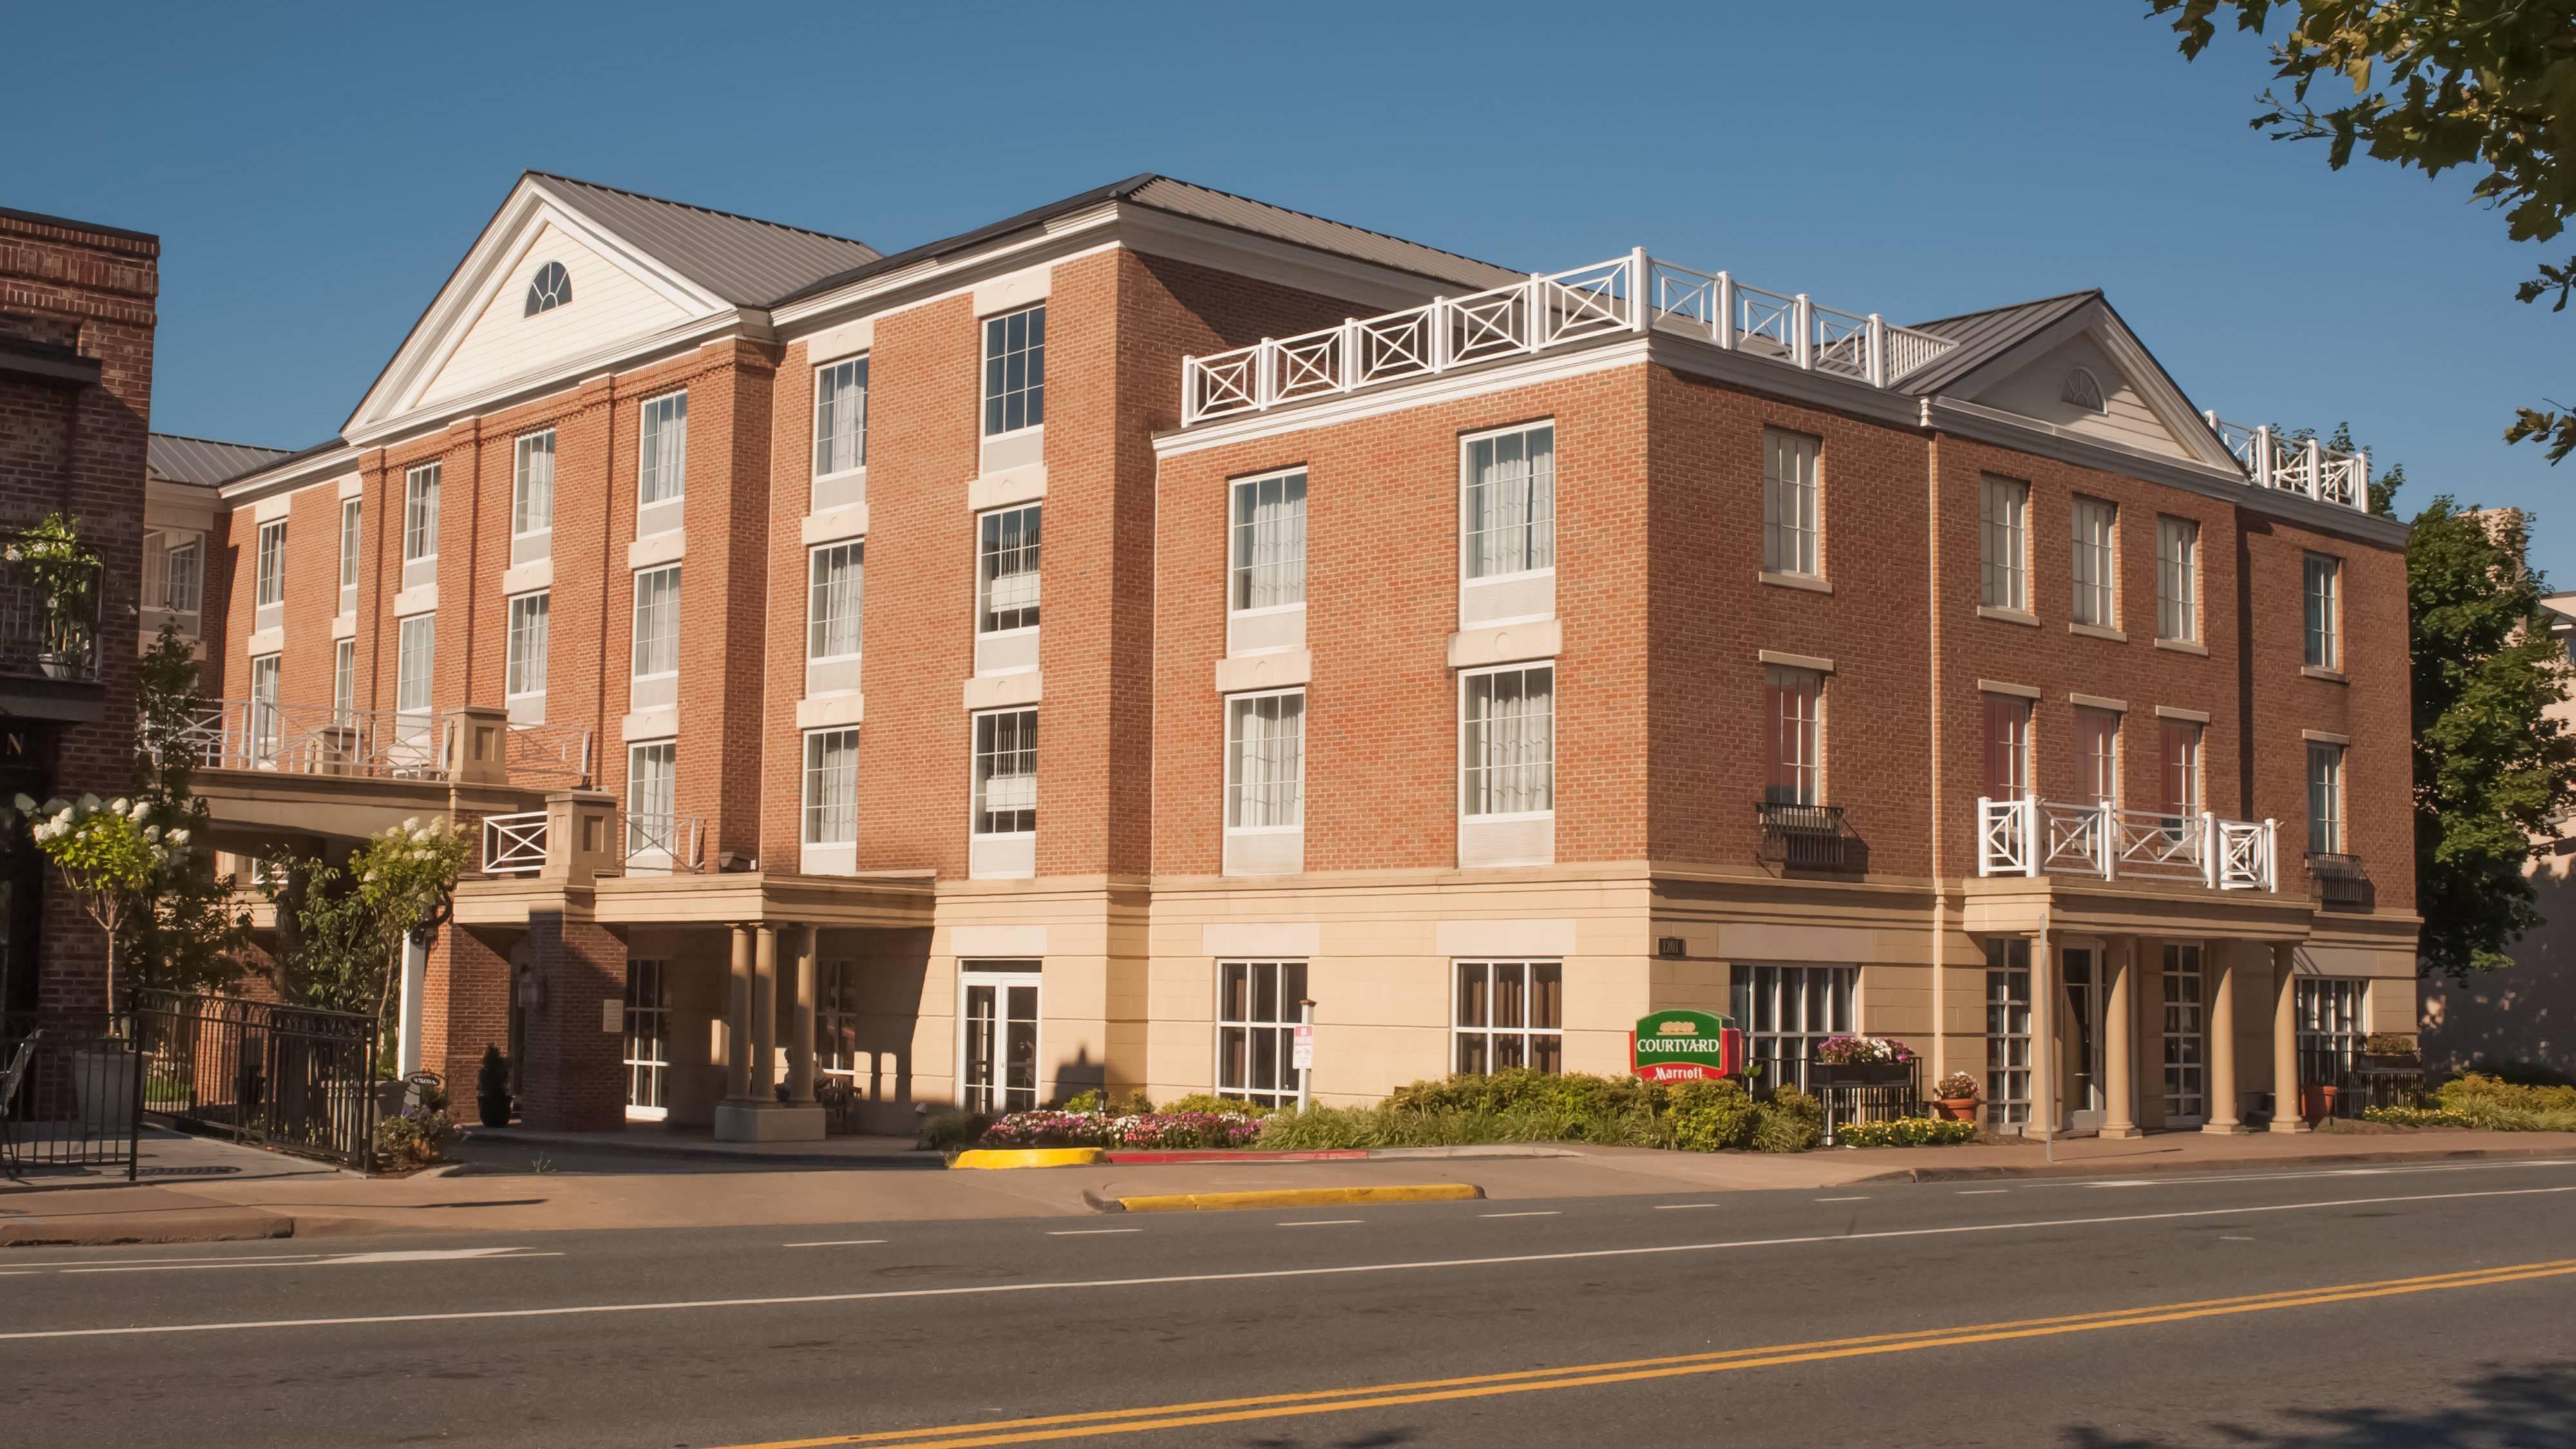 Courtyard by Marriott Charlottesville - University Medical Center image 23